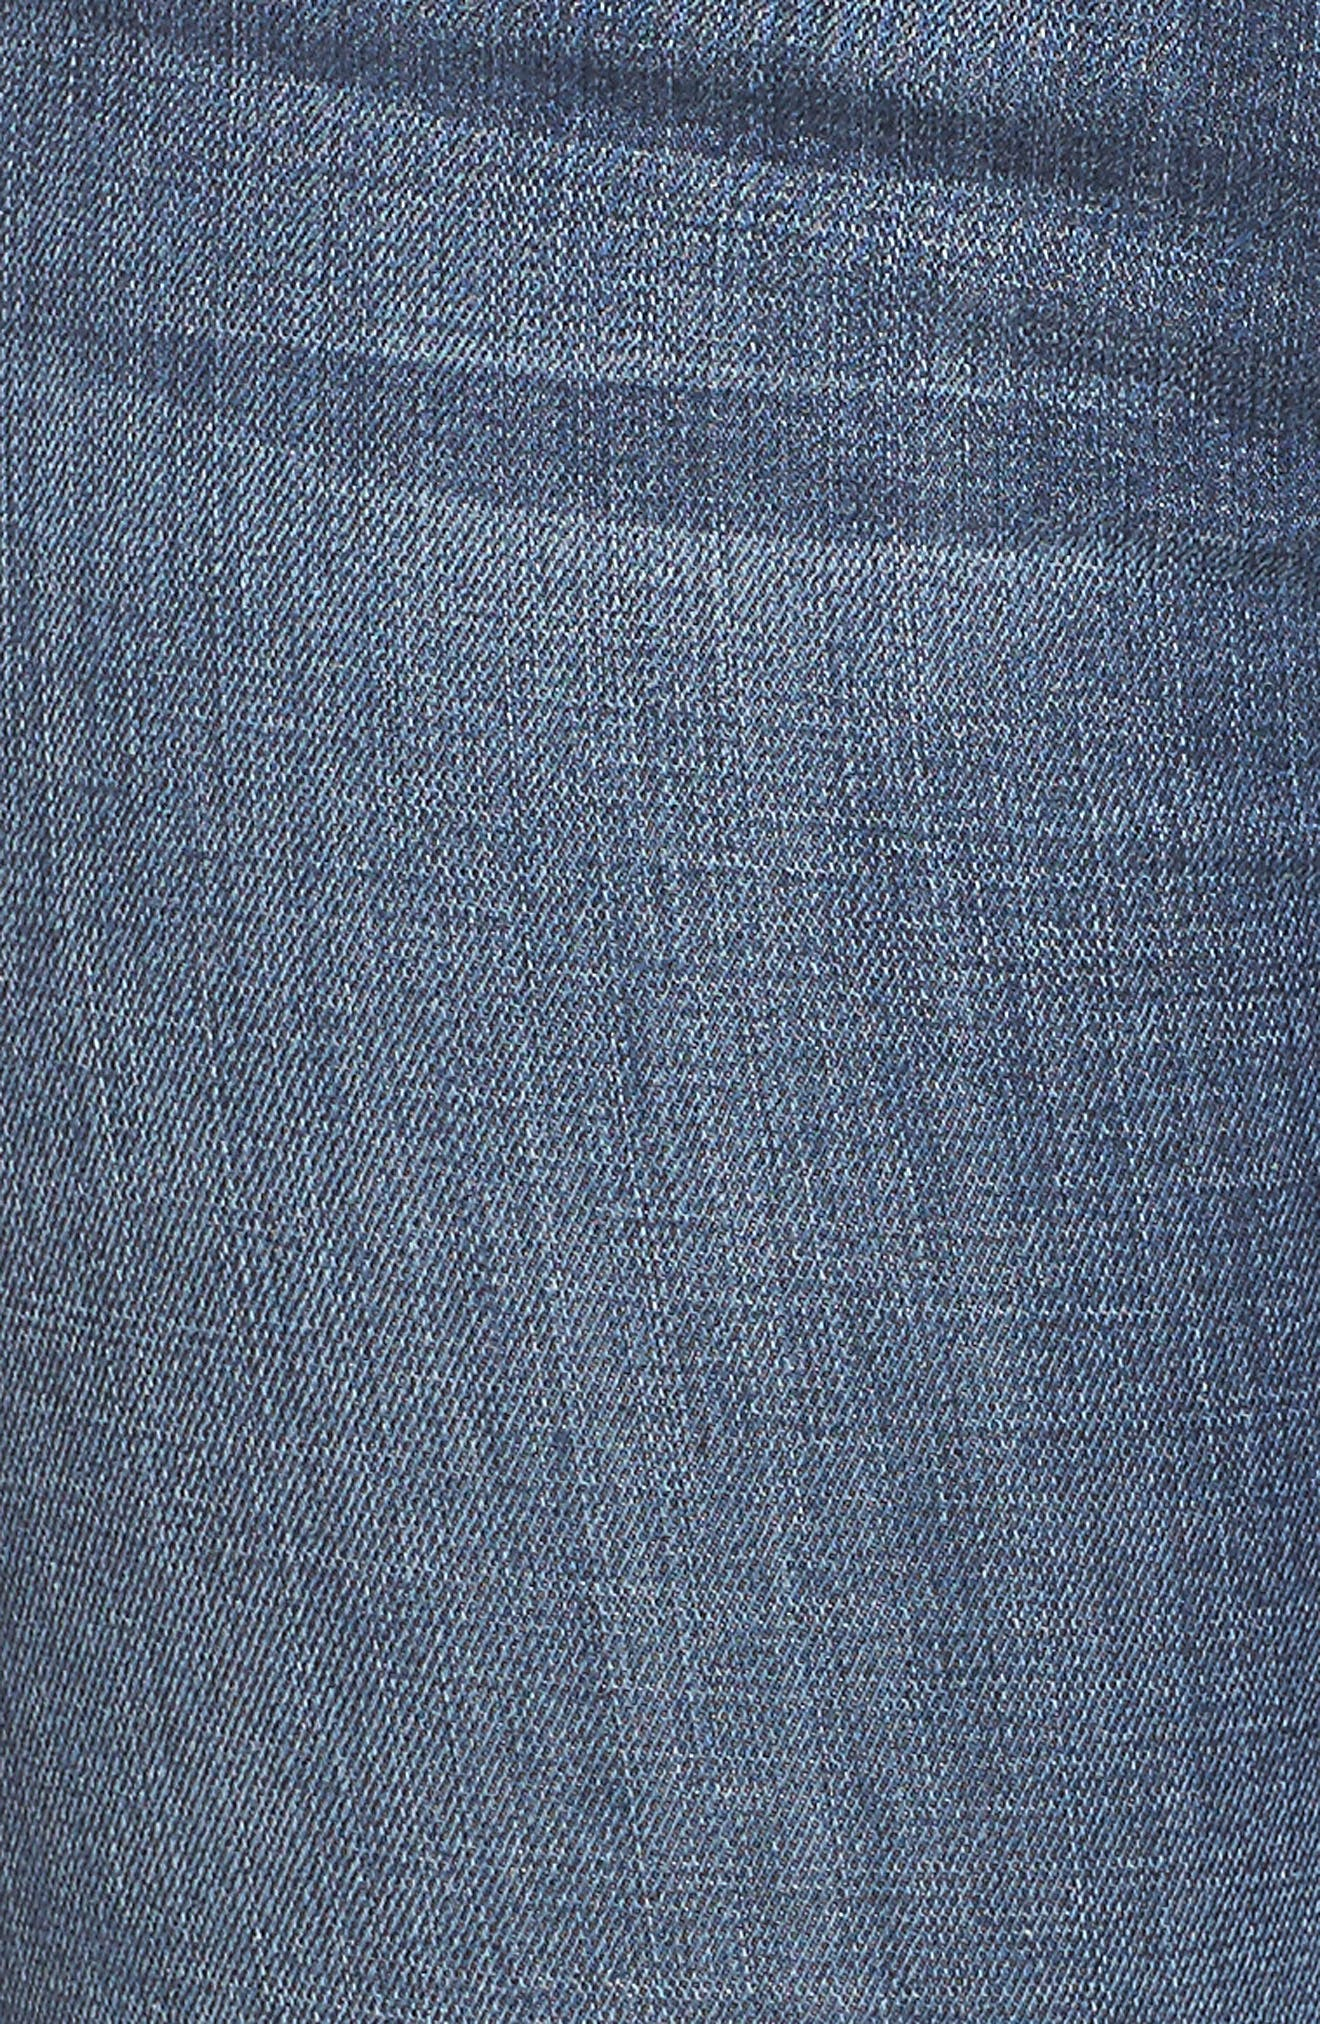 Alternate Image 11  - Good American Good Legs High Waist Ankle Skinny Jeans (Blue 084) (Regular & Plus Size)